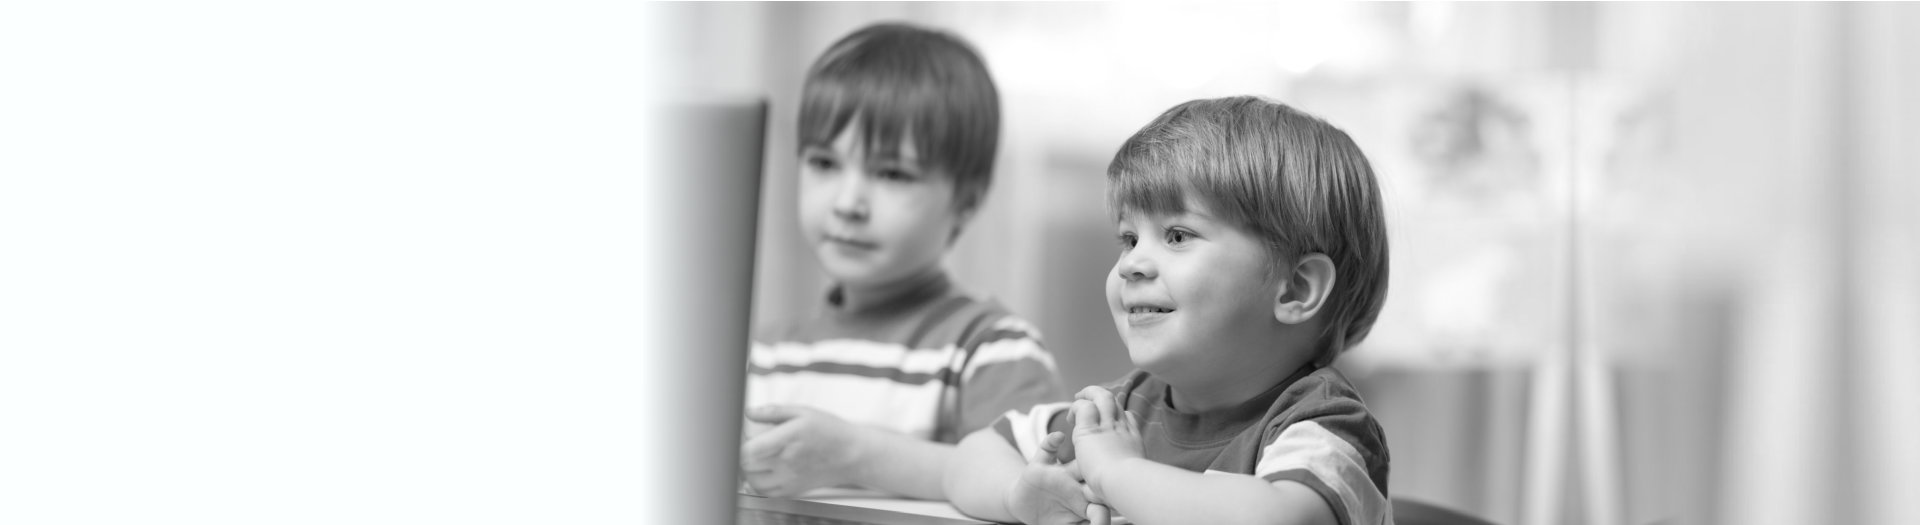 two children watching